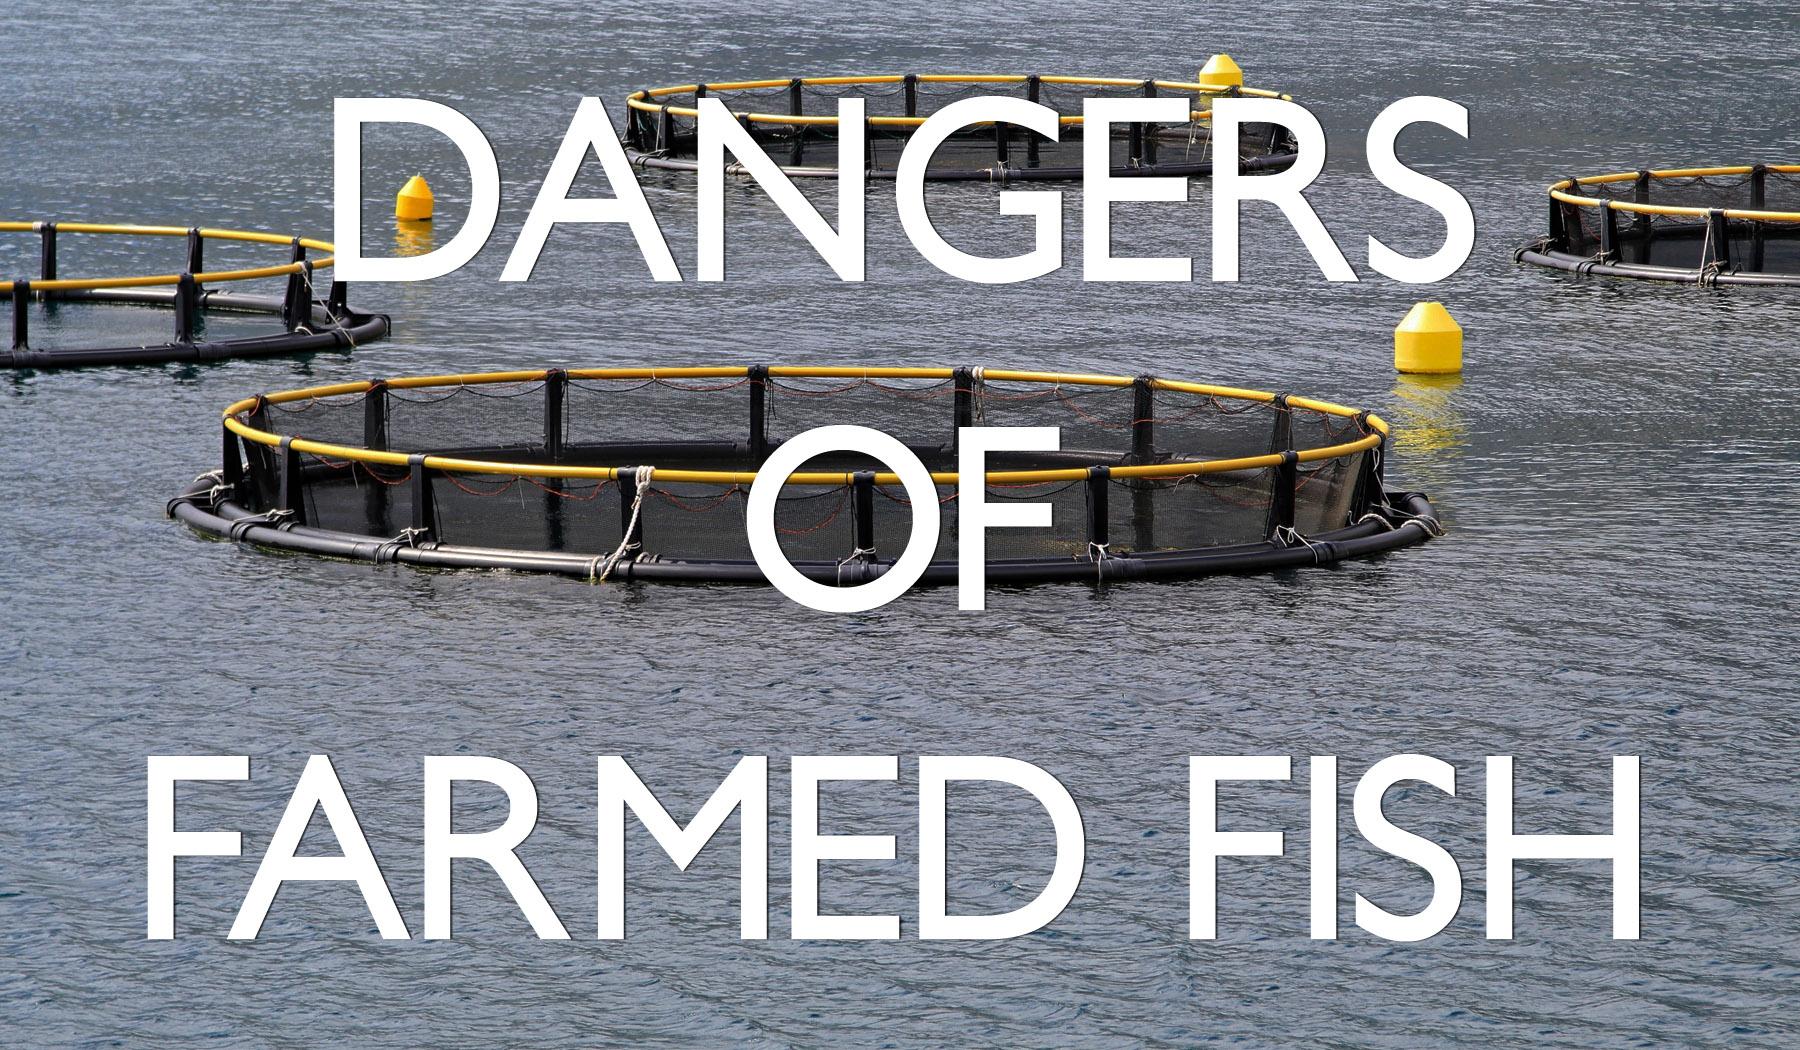 Health Dangers: Farmed Fish